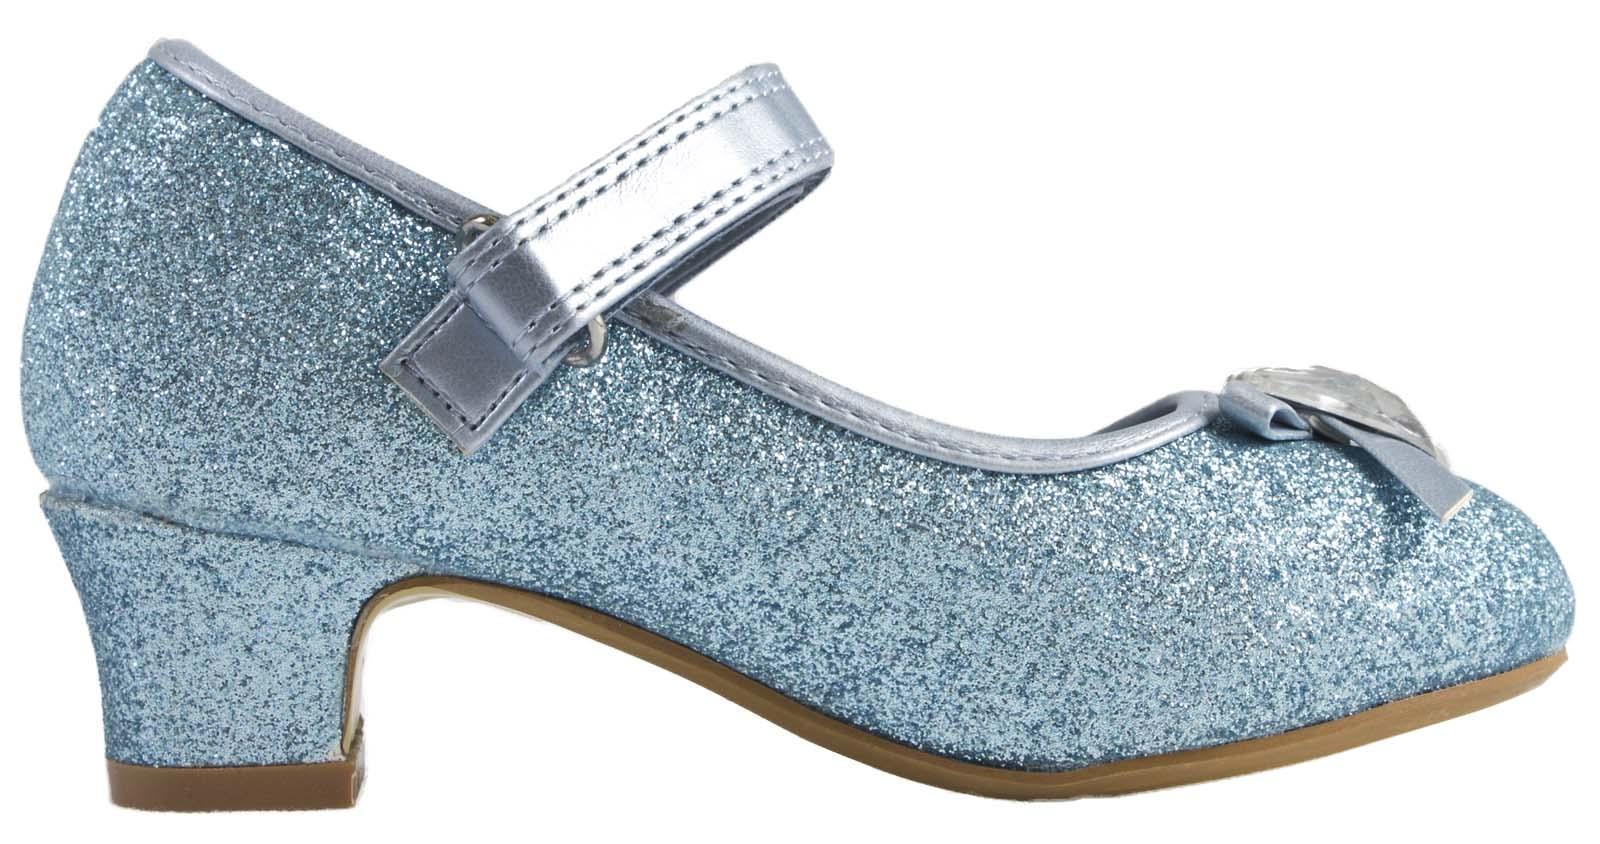 Girls Low Heel Princess Shoes